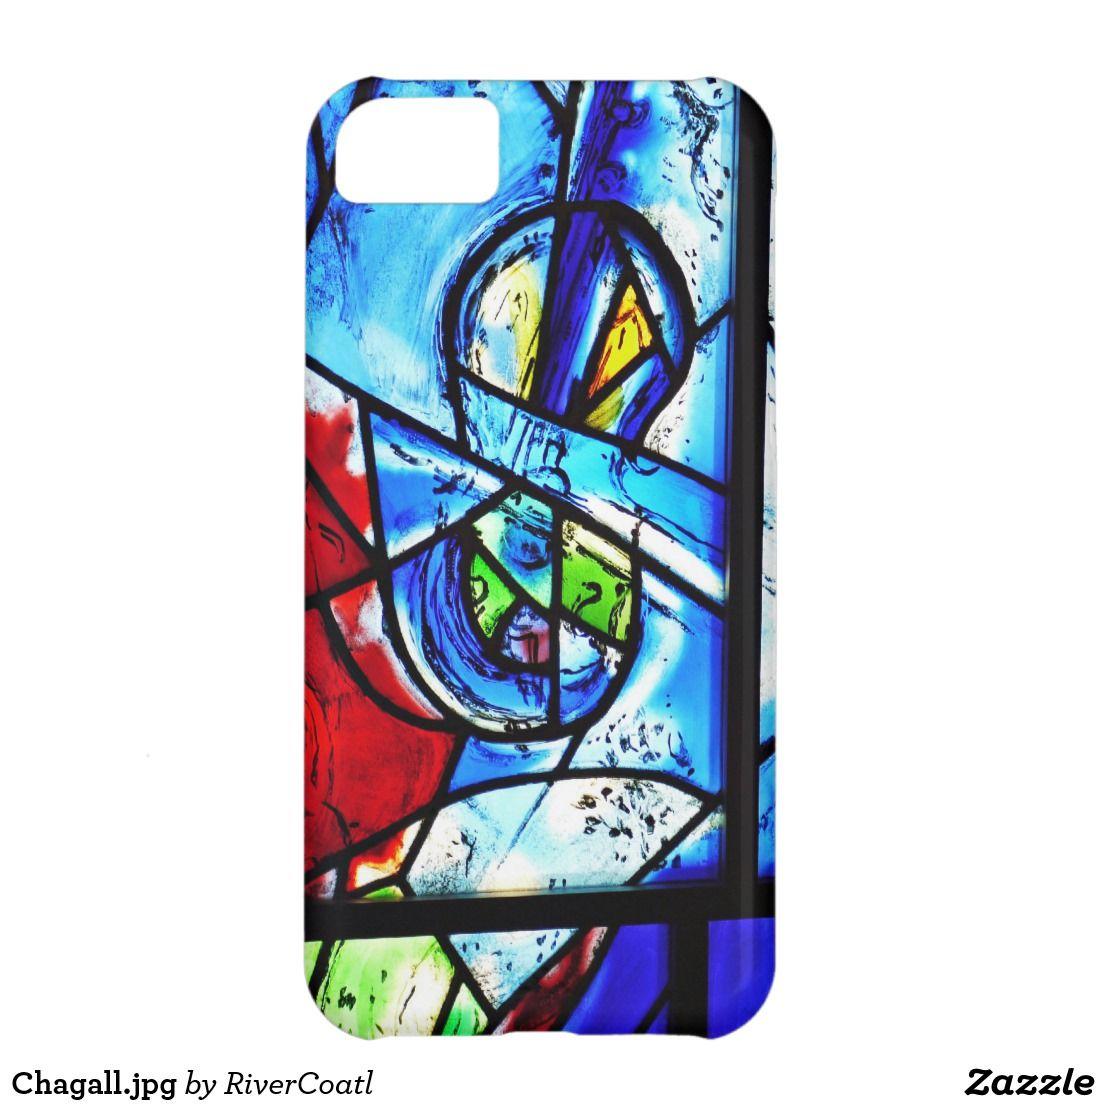 Chagalljpg casemate iphone case iphone